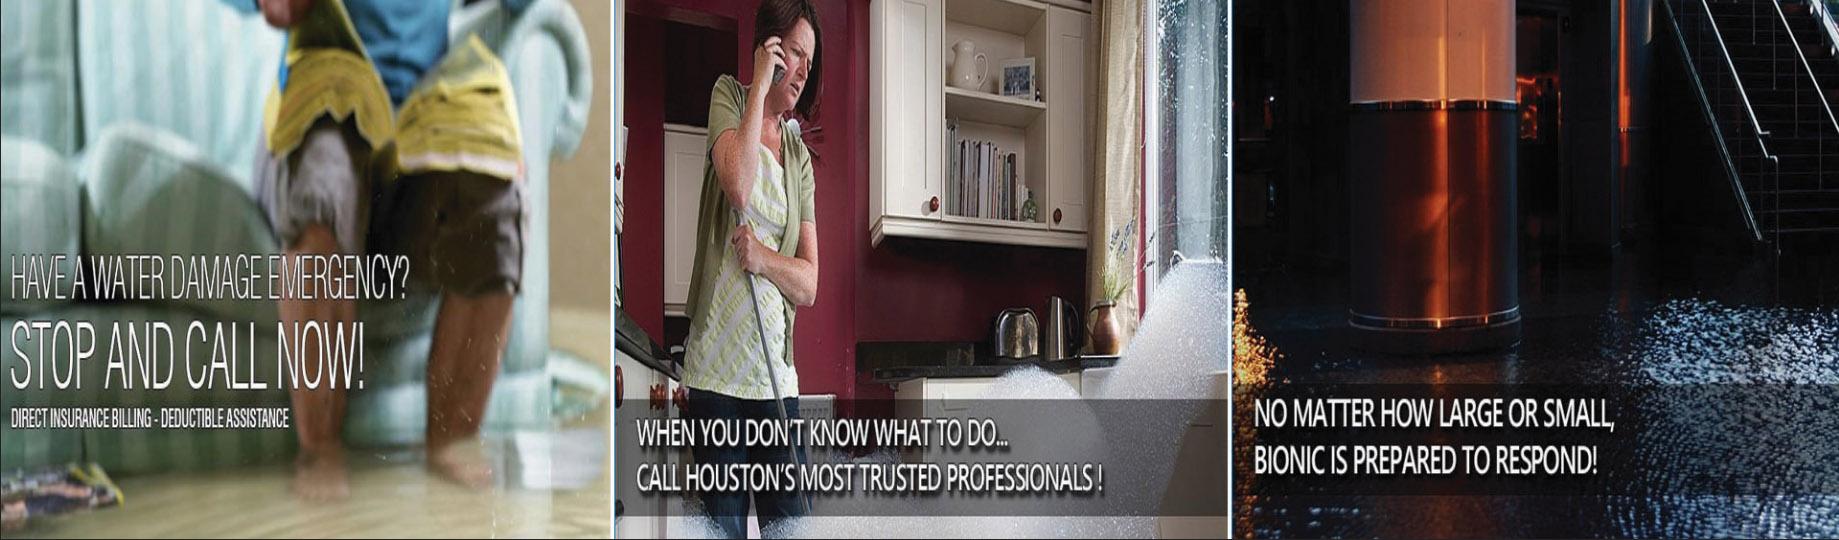 Bionic Emergency Services Houston TX